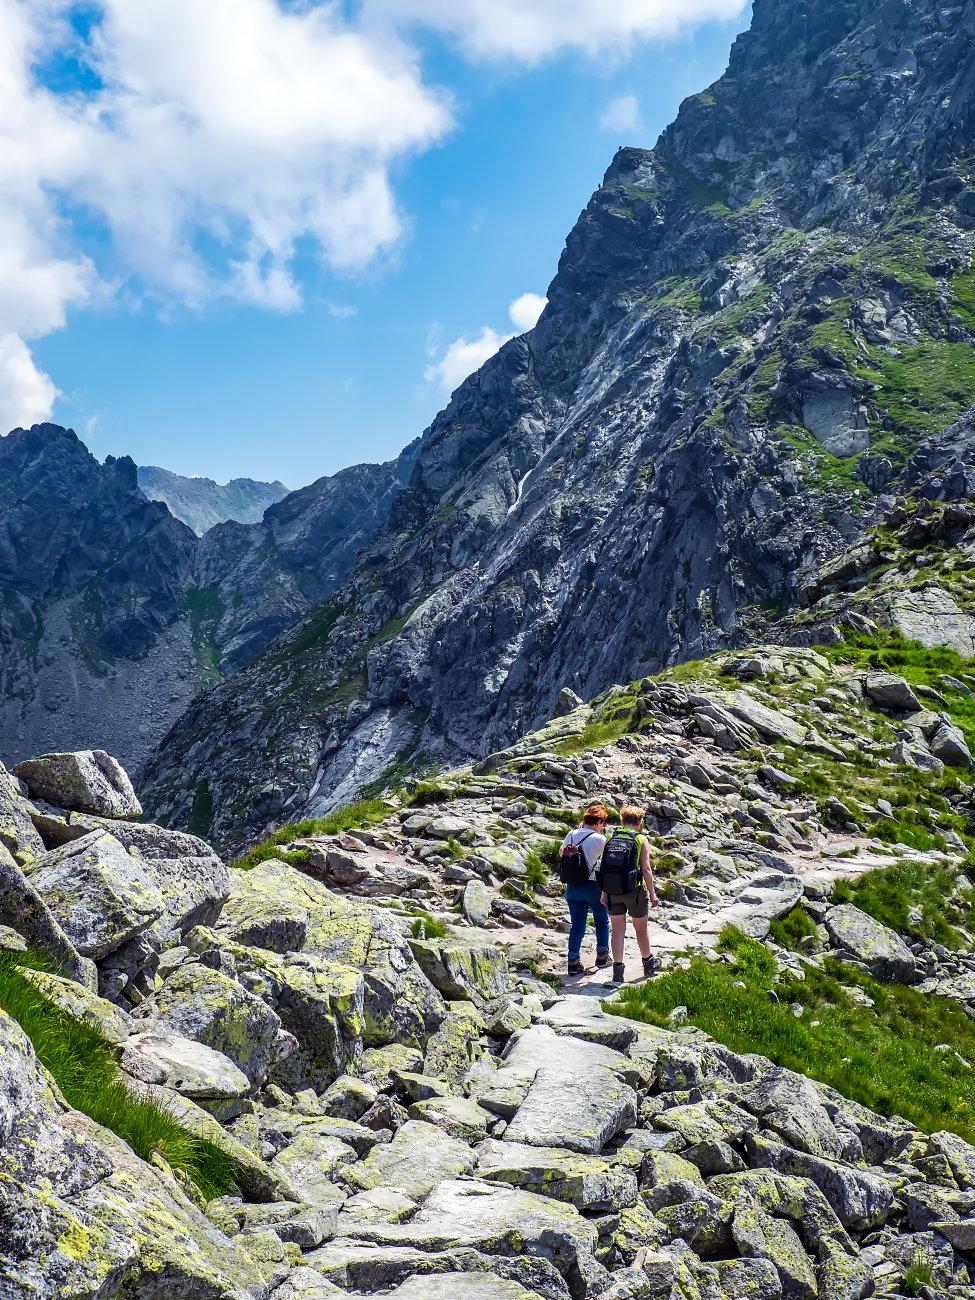 Trekking In The Tatras Mountains